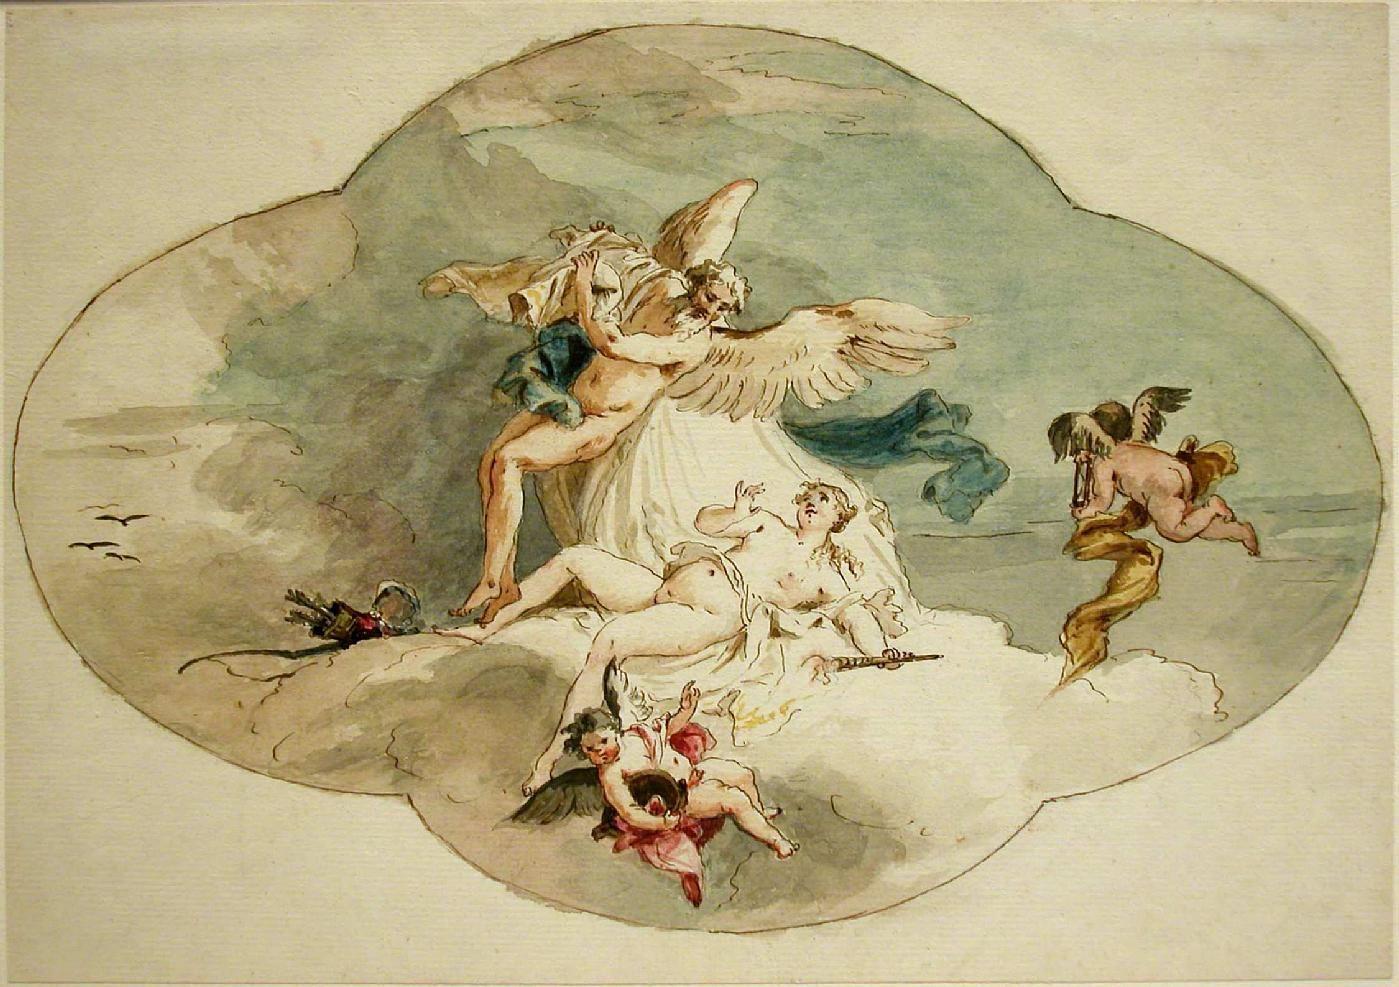 http://upload.wikimedia.org/wikipedia/commons/2/28/Cedini%2C_Costantino_-_Chronos_and_Venus%2C_Study_for_a_Ceiling_Fresco_-_18th_century.JPG